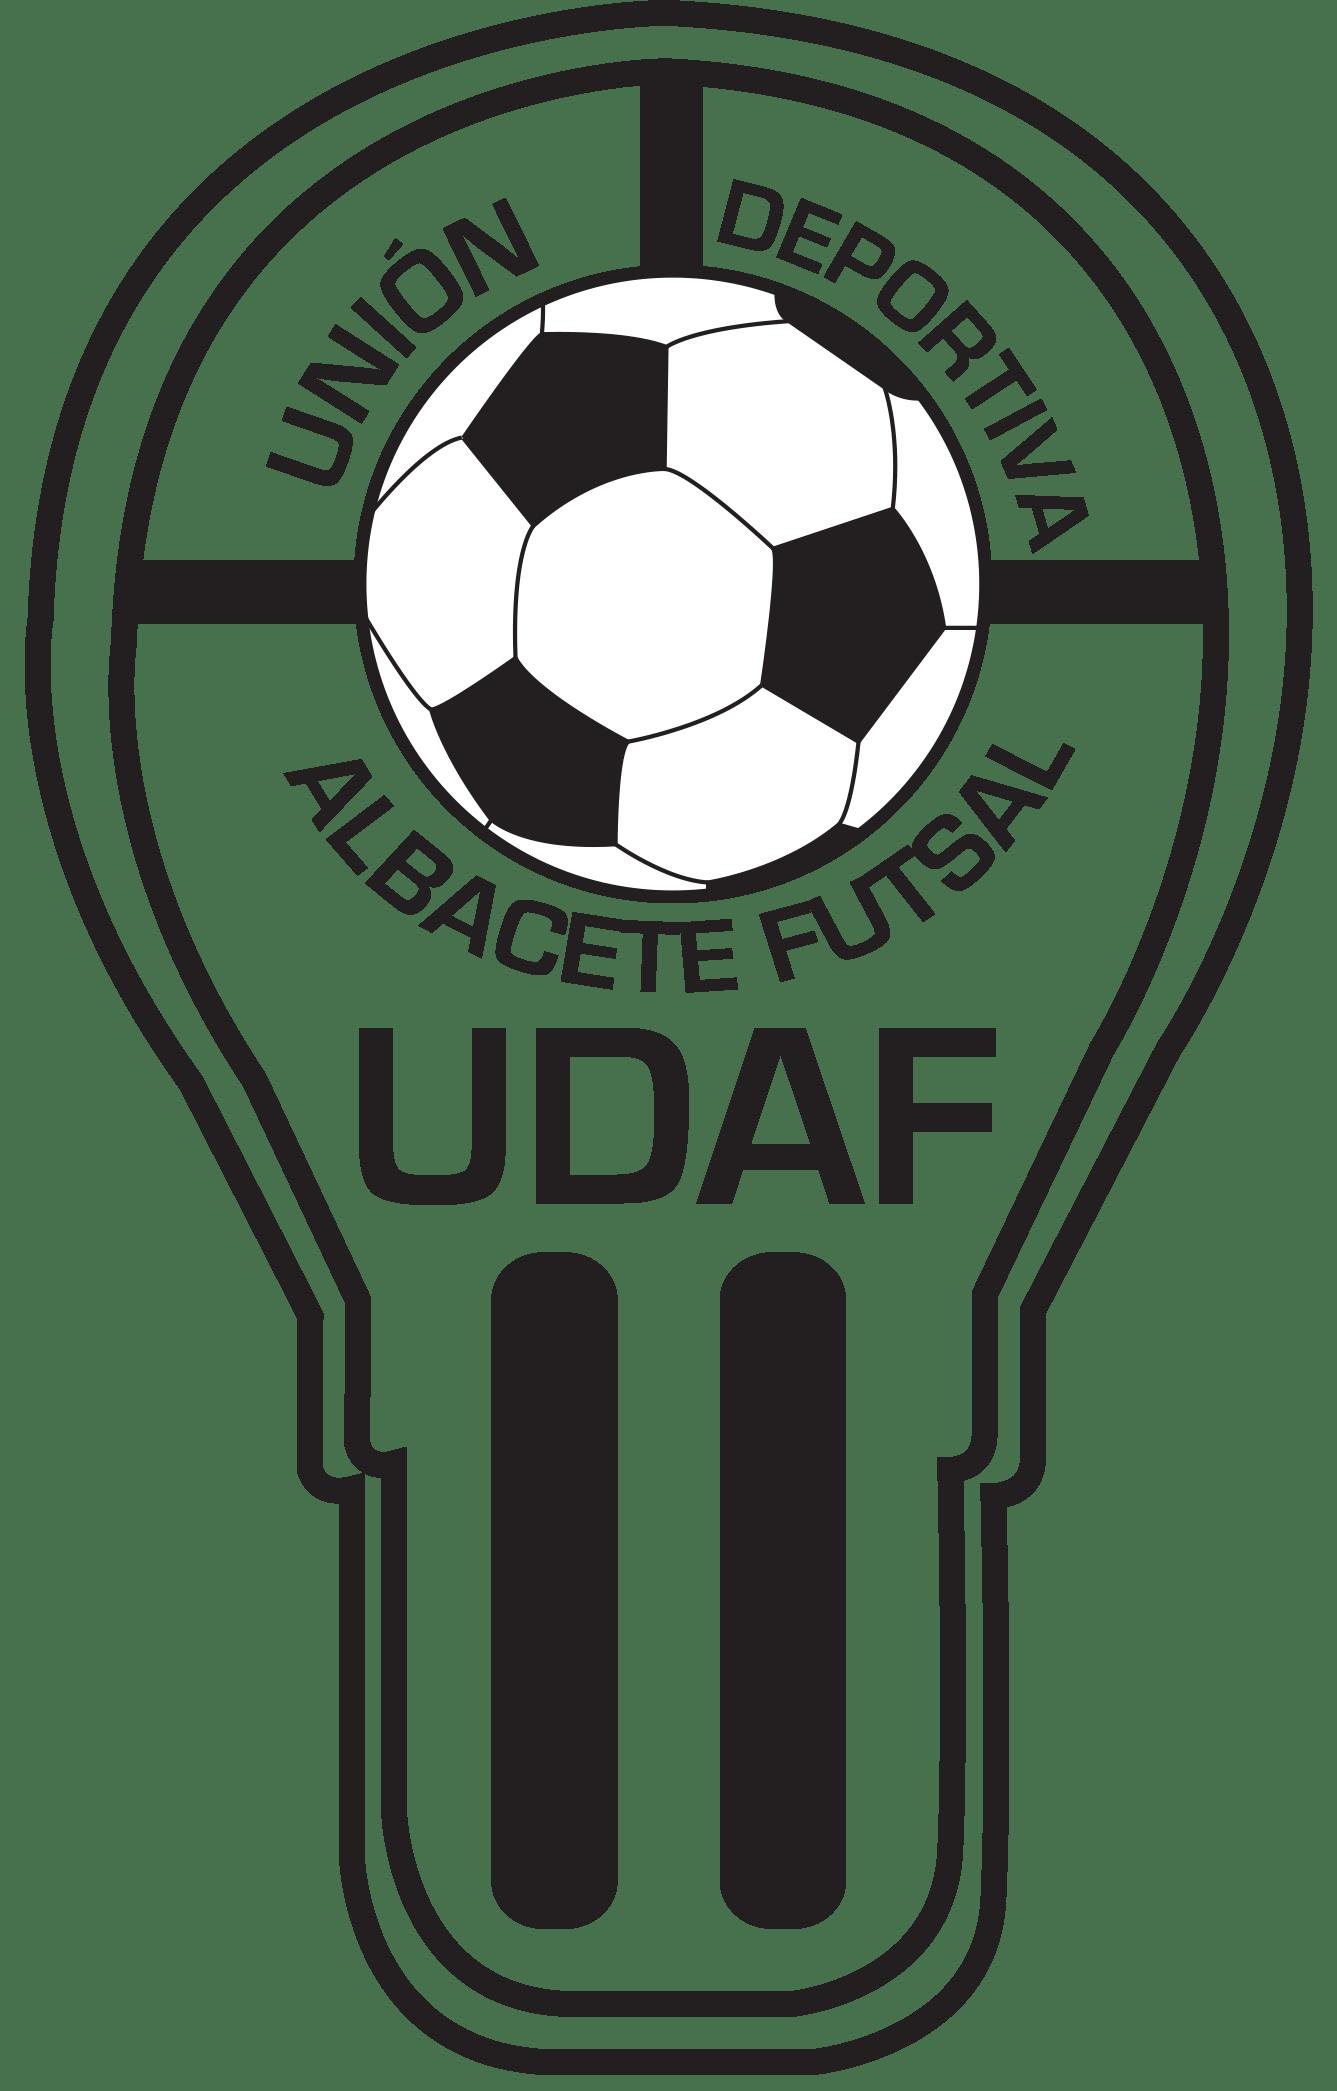 Udaf Albacete Futsal